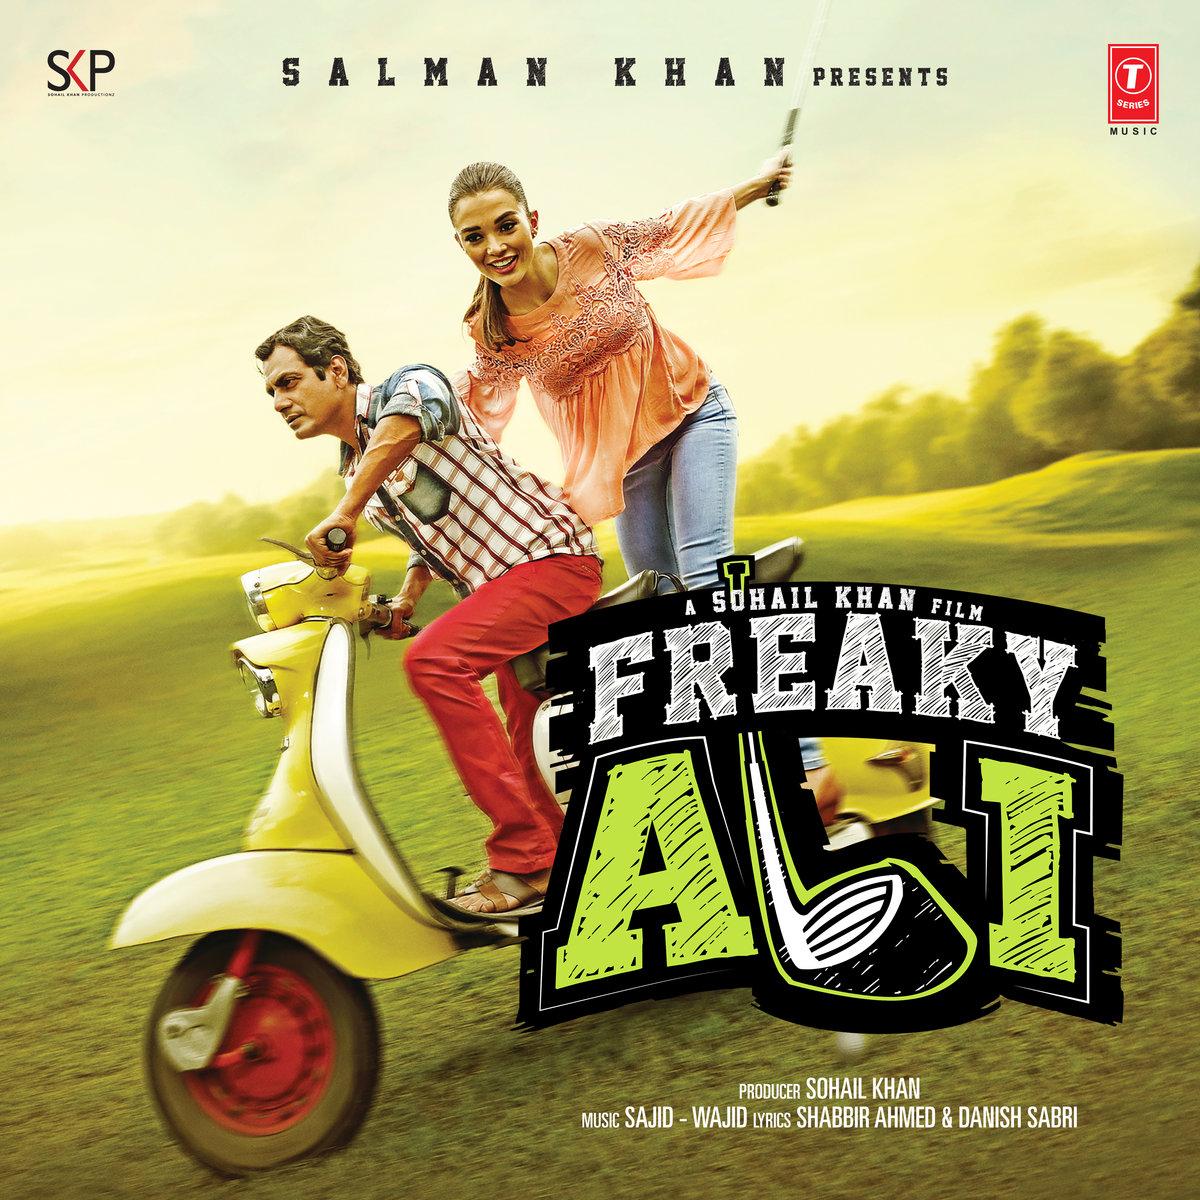 The Sarkar Raj 2 Full Movie Free Download | redhyarecual